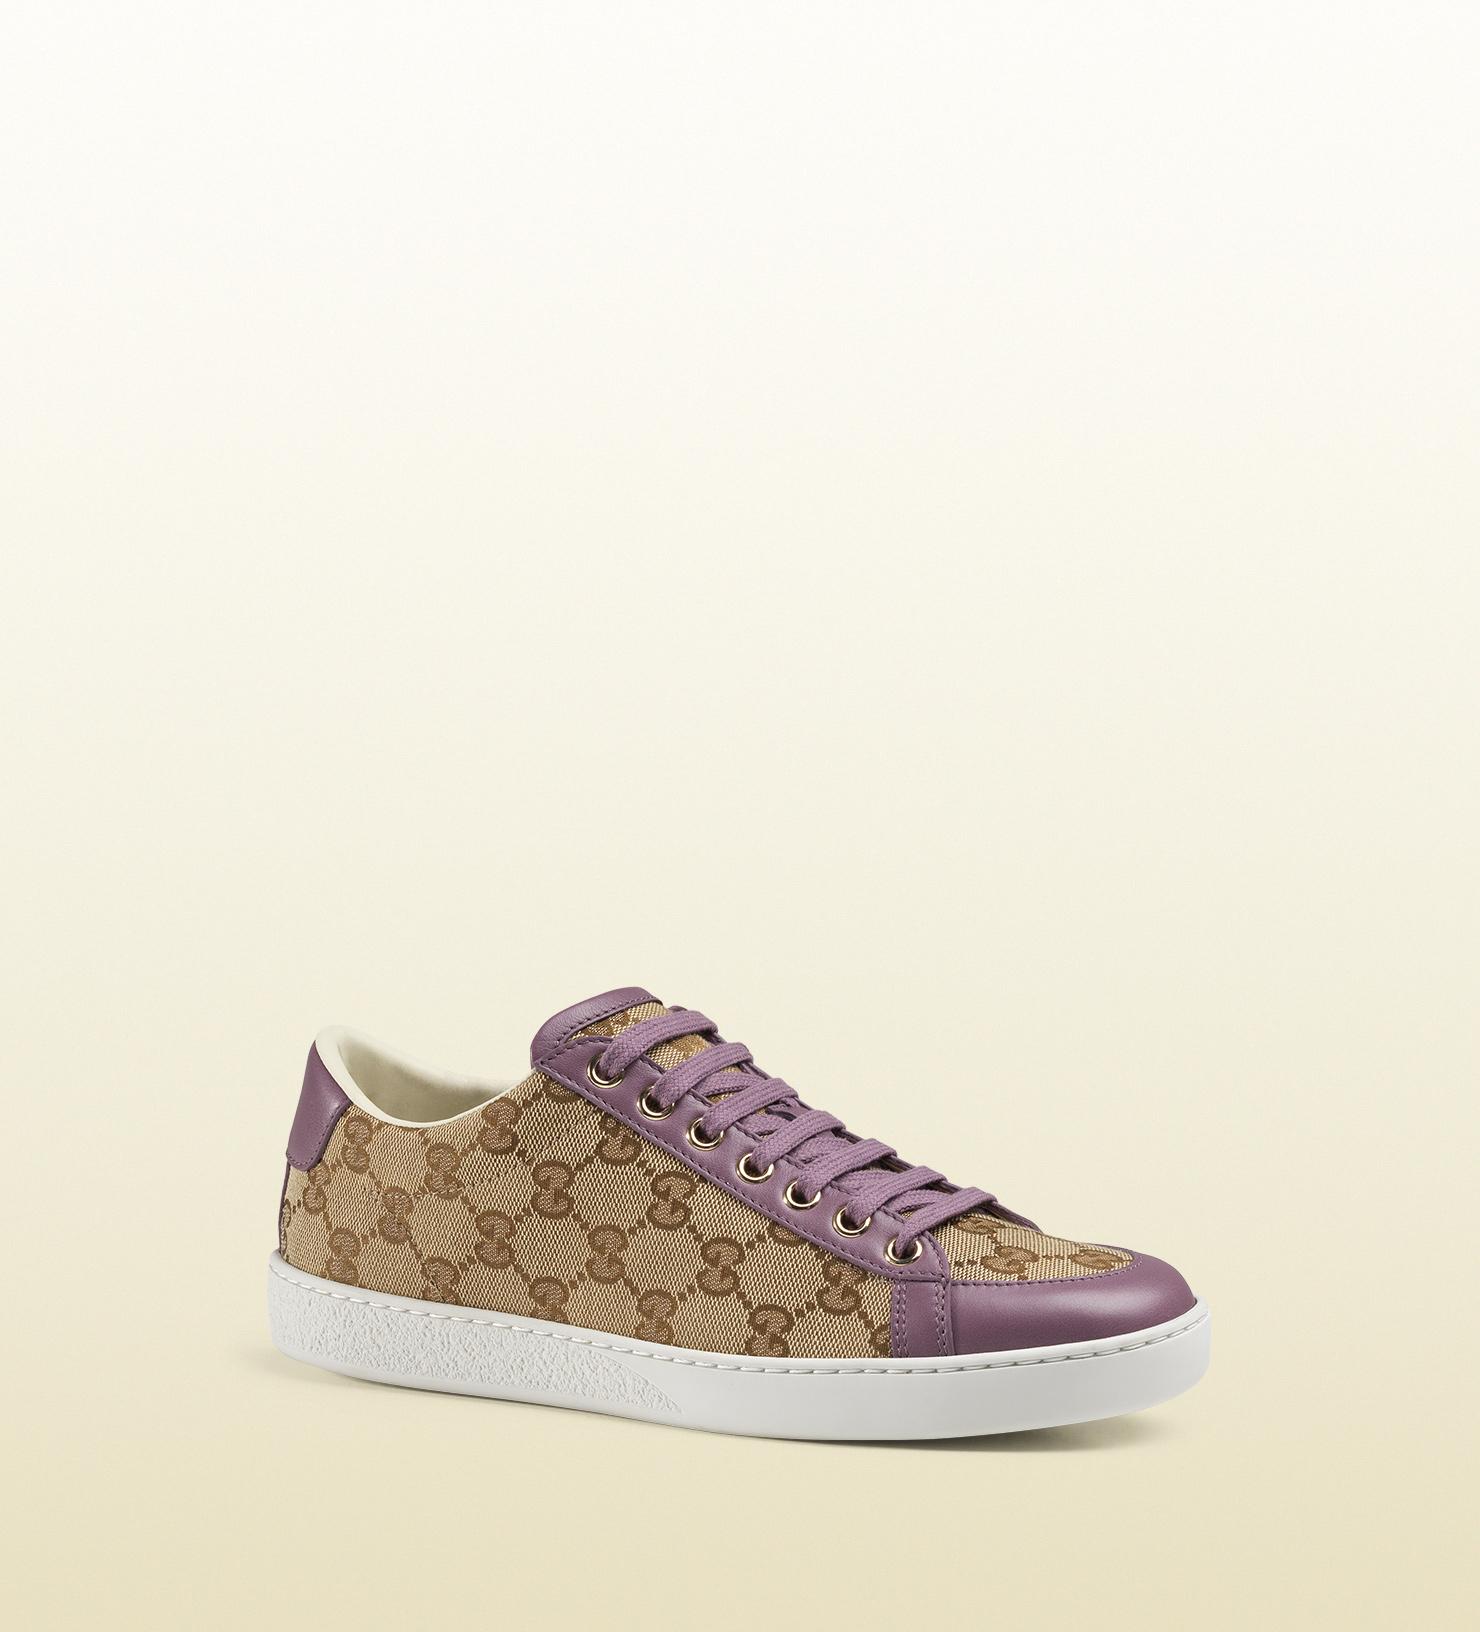 c5b0fc36b41 Lyst - Gucci Brooklyn Original Gg Canvas Low-top Sneaker in Natural